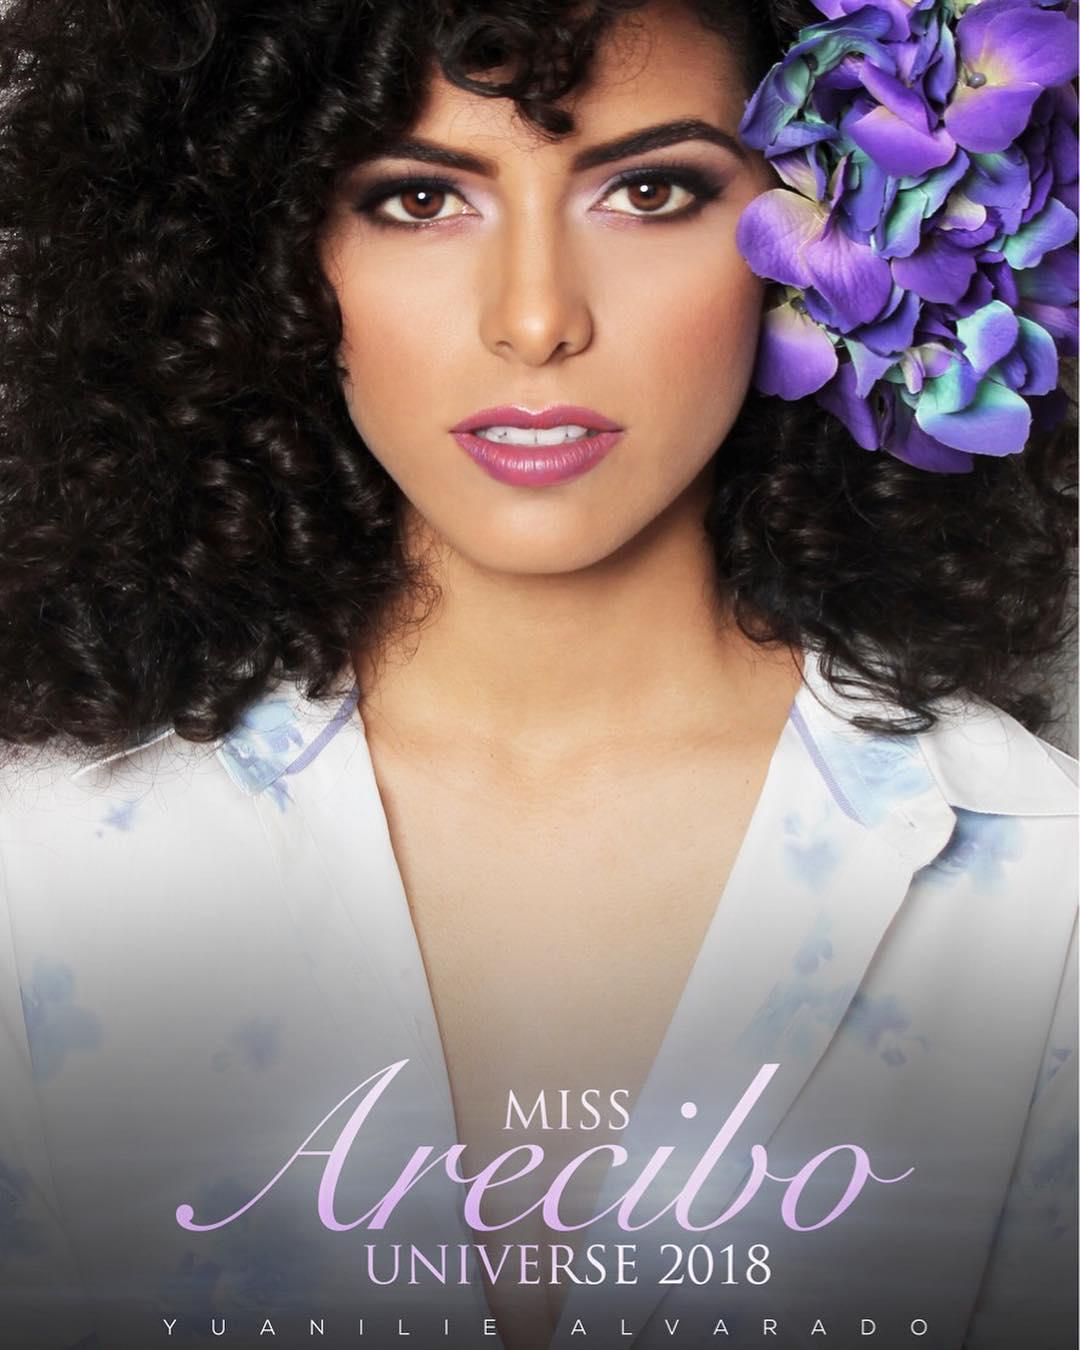 yuanilie alvarado, segunda finalista de reyna hispanoamericana 2019. 32910710